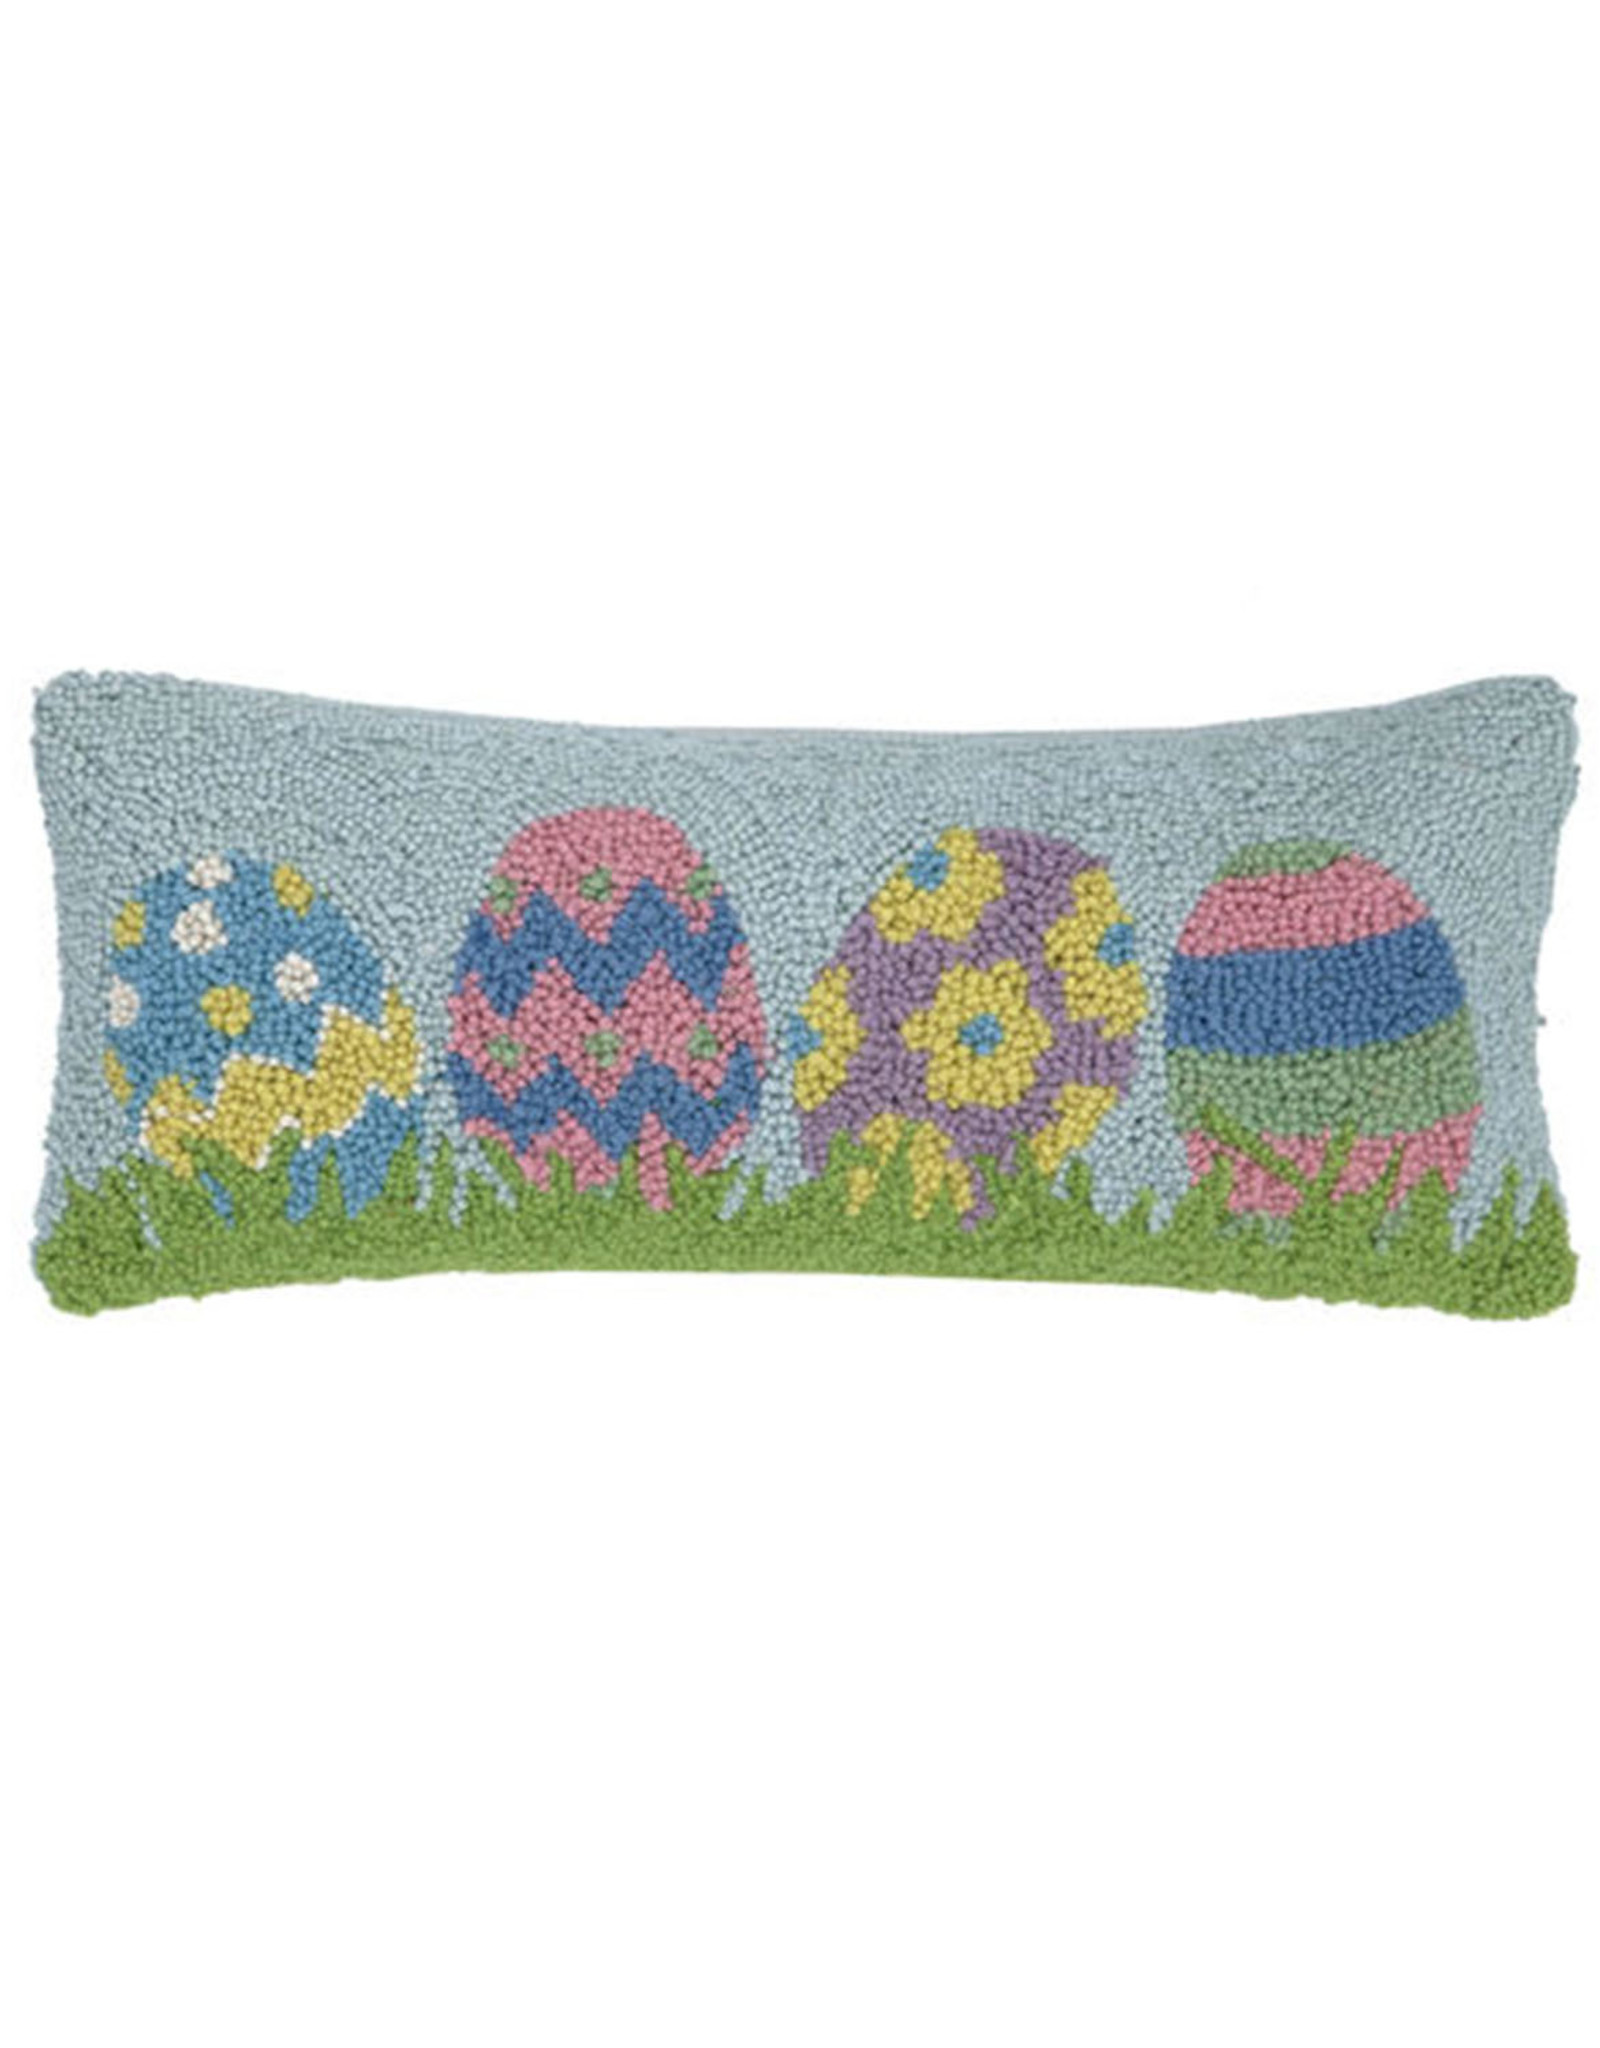 "Easter Egg Hook Pillow - 8"" x 20"""